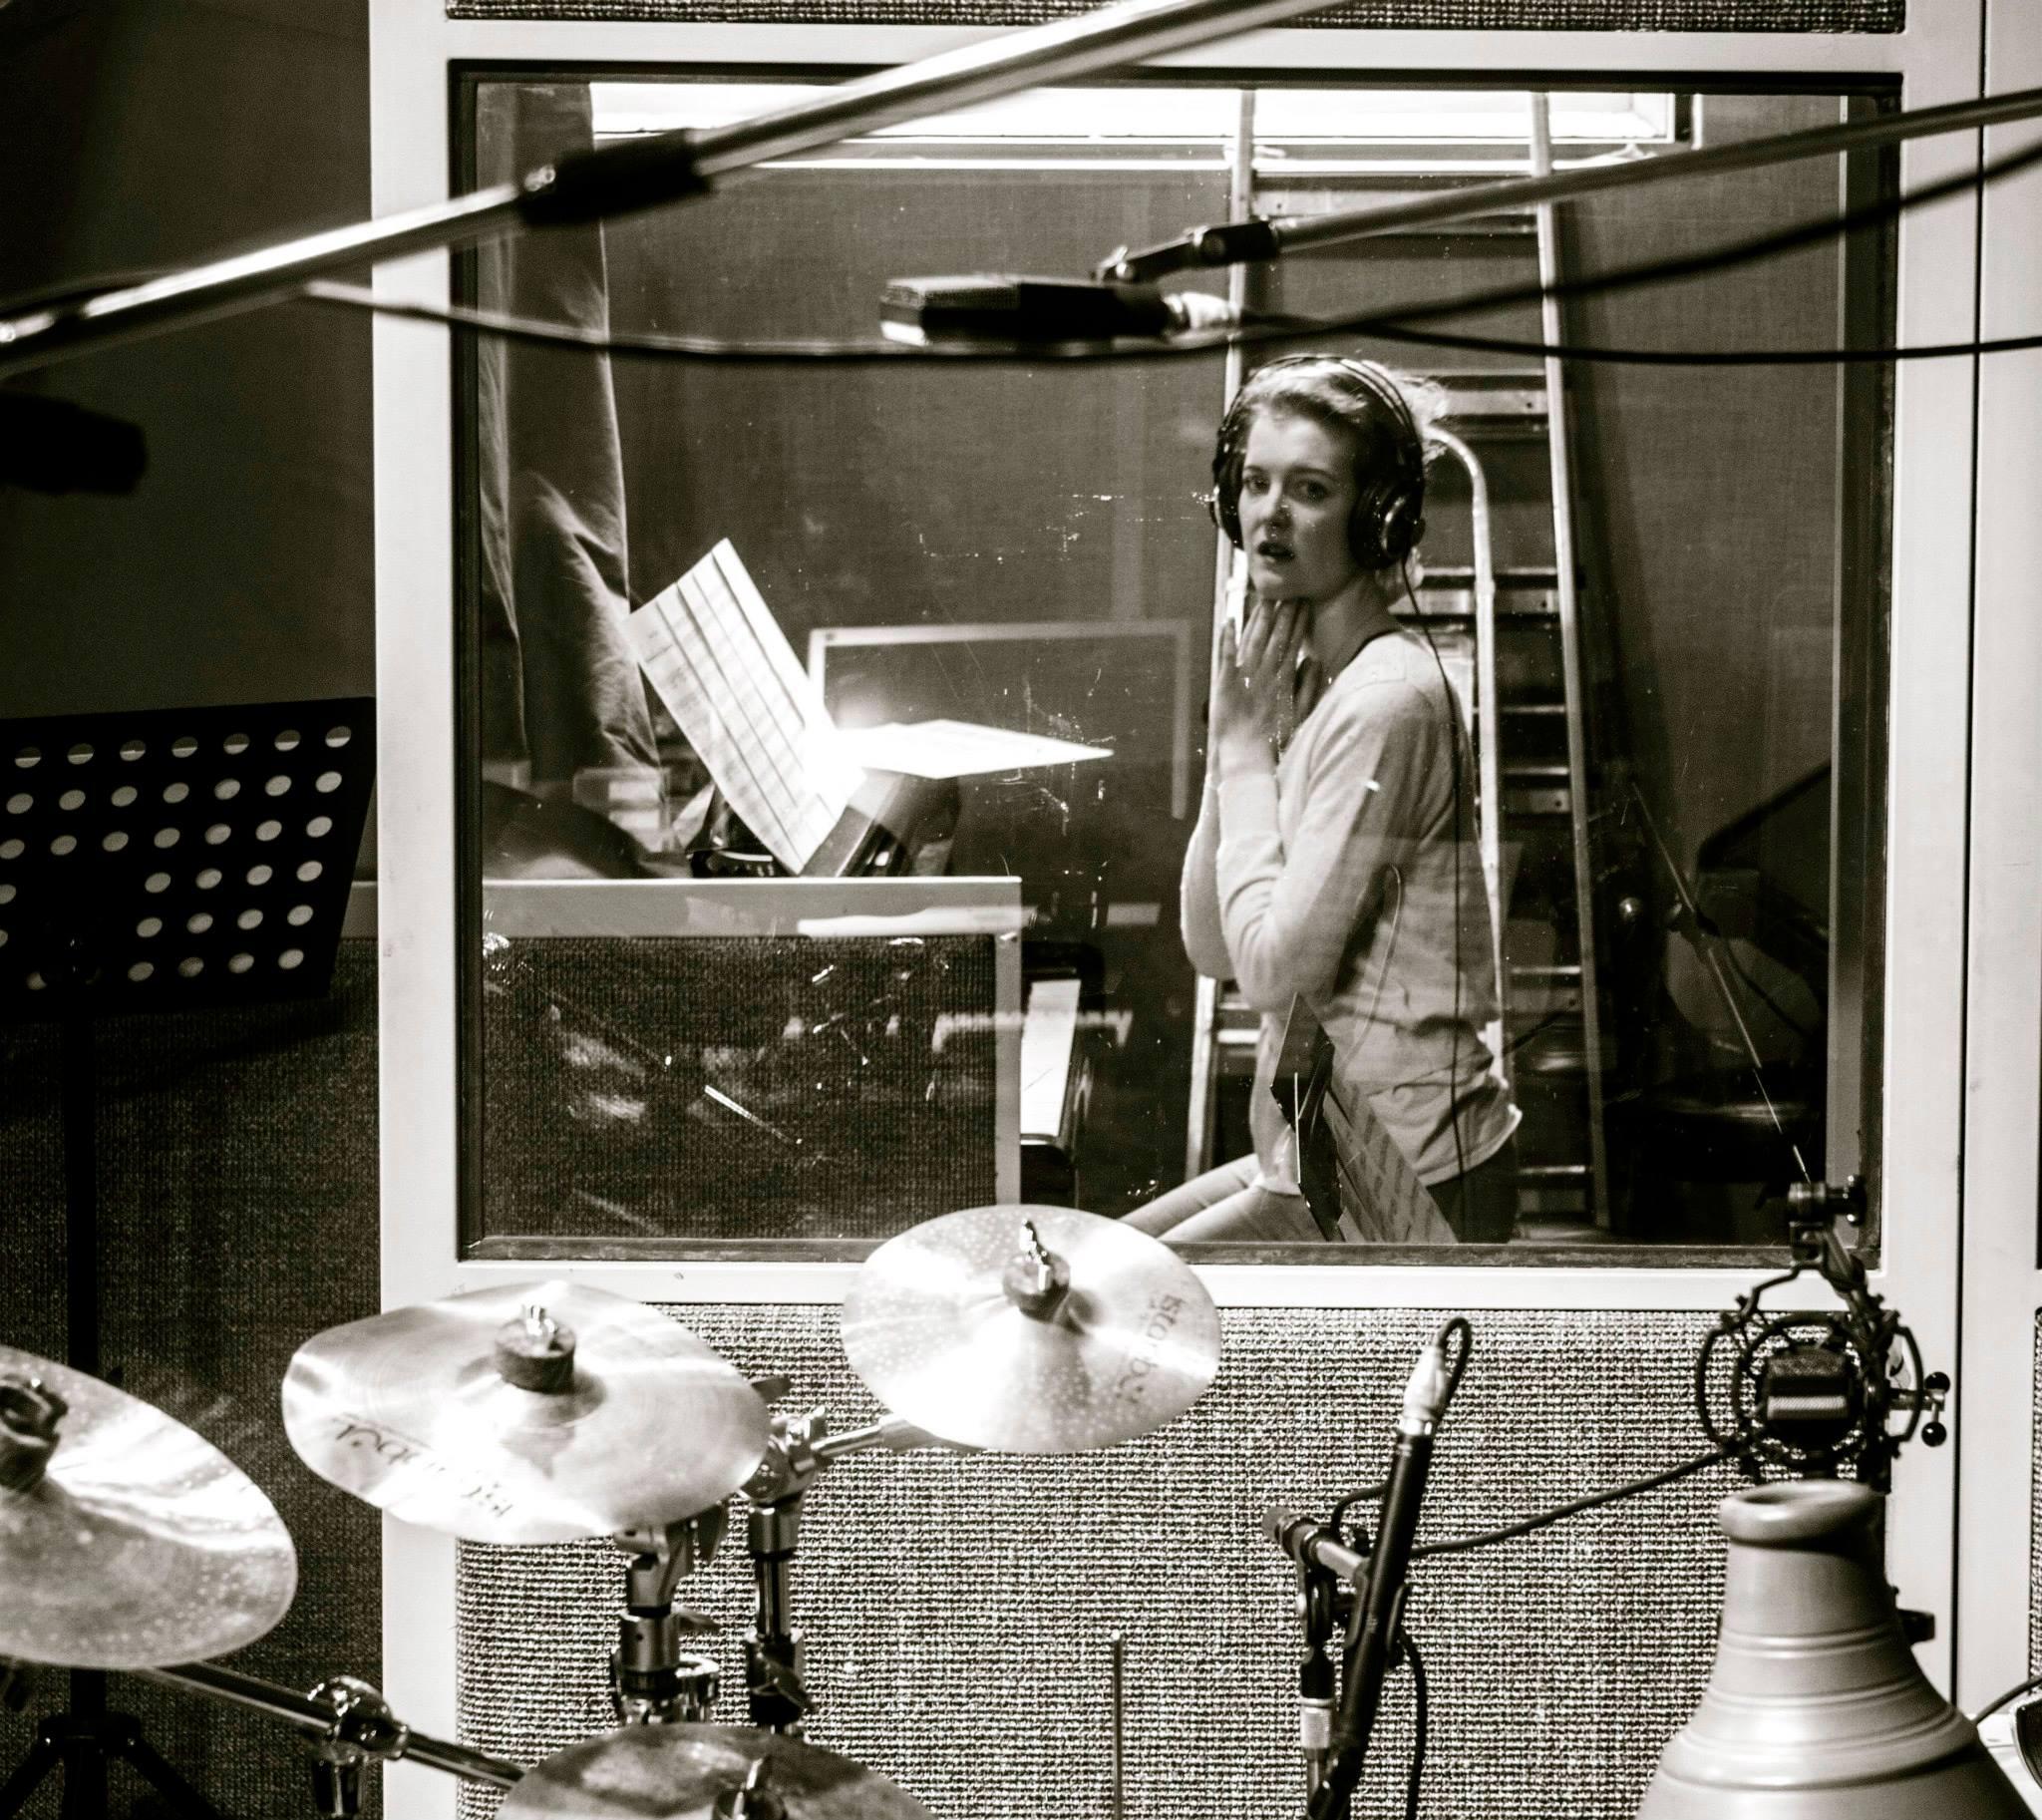 Edentide studio session